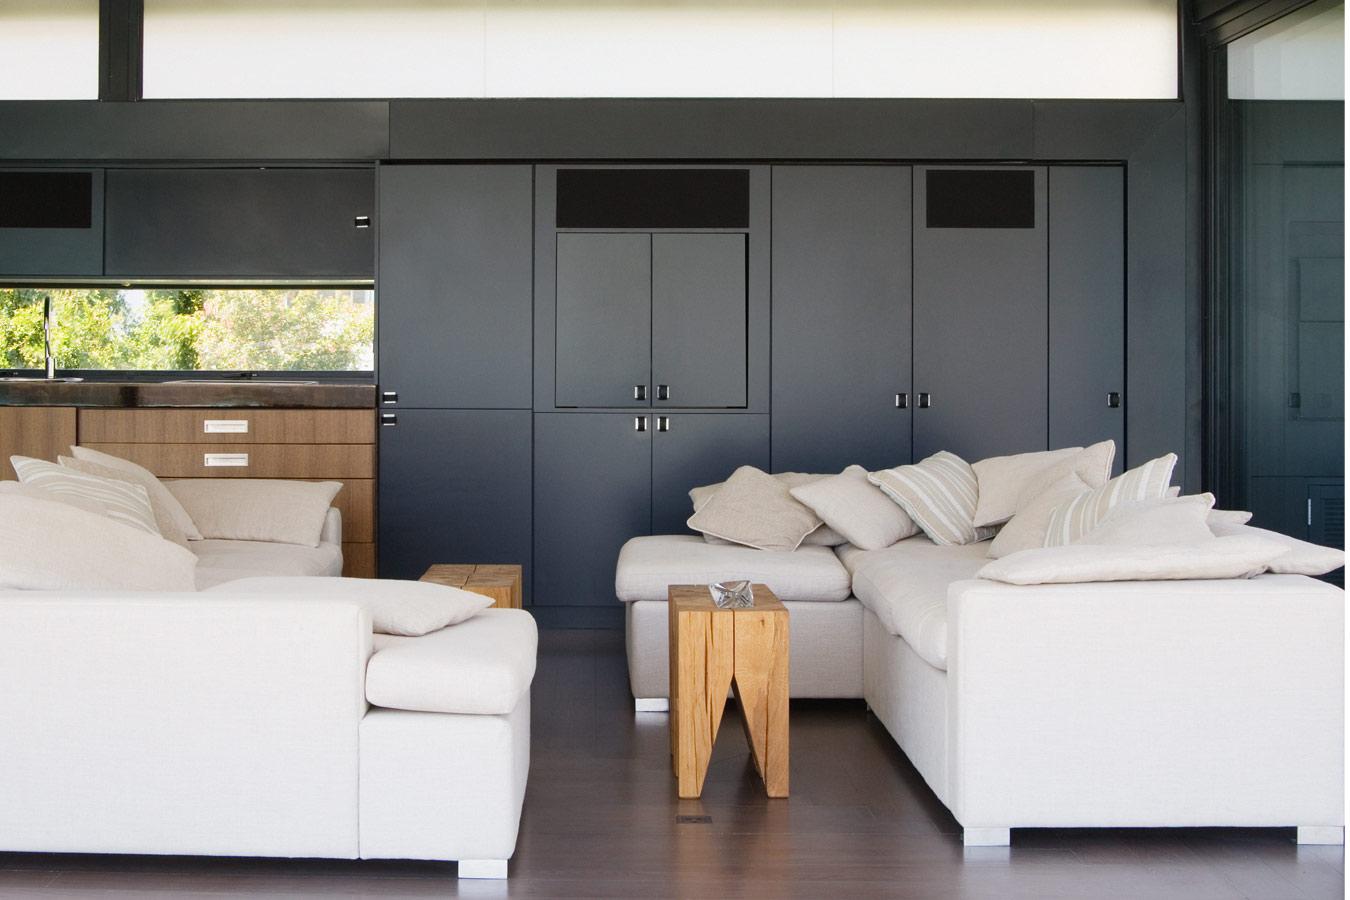 Woonkamer Kast Wit : Fano woonkamer wit grijs hoogglans woonkamers elit meubel